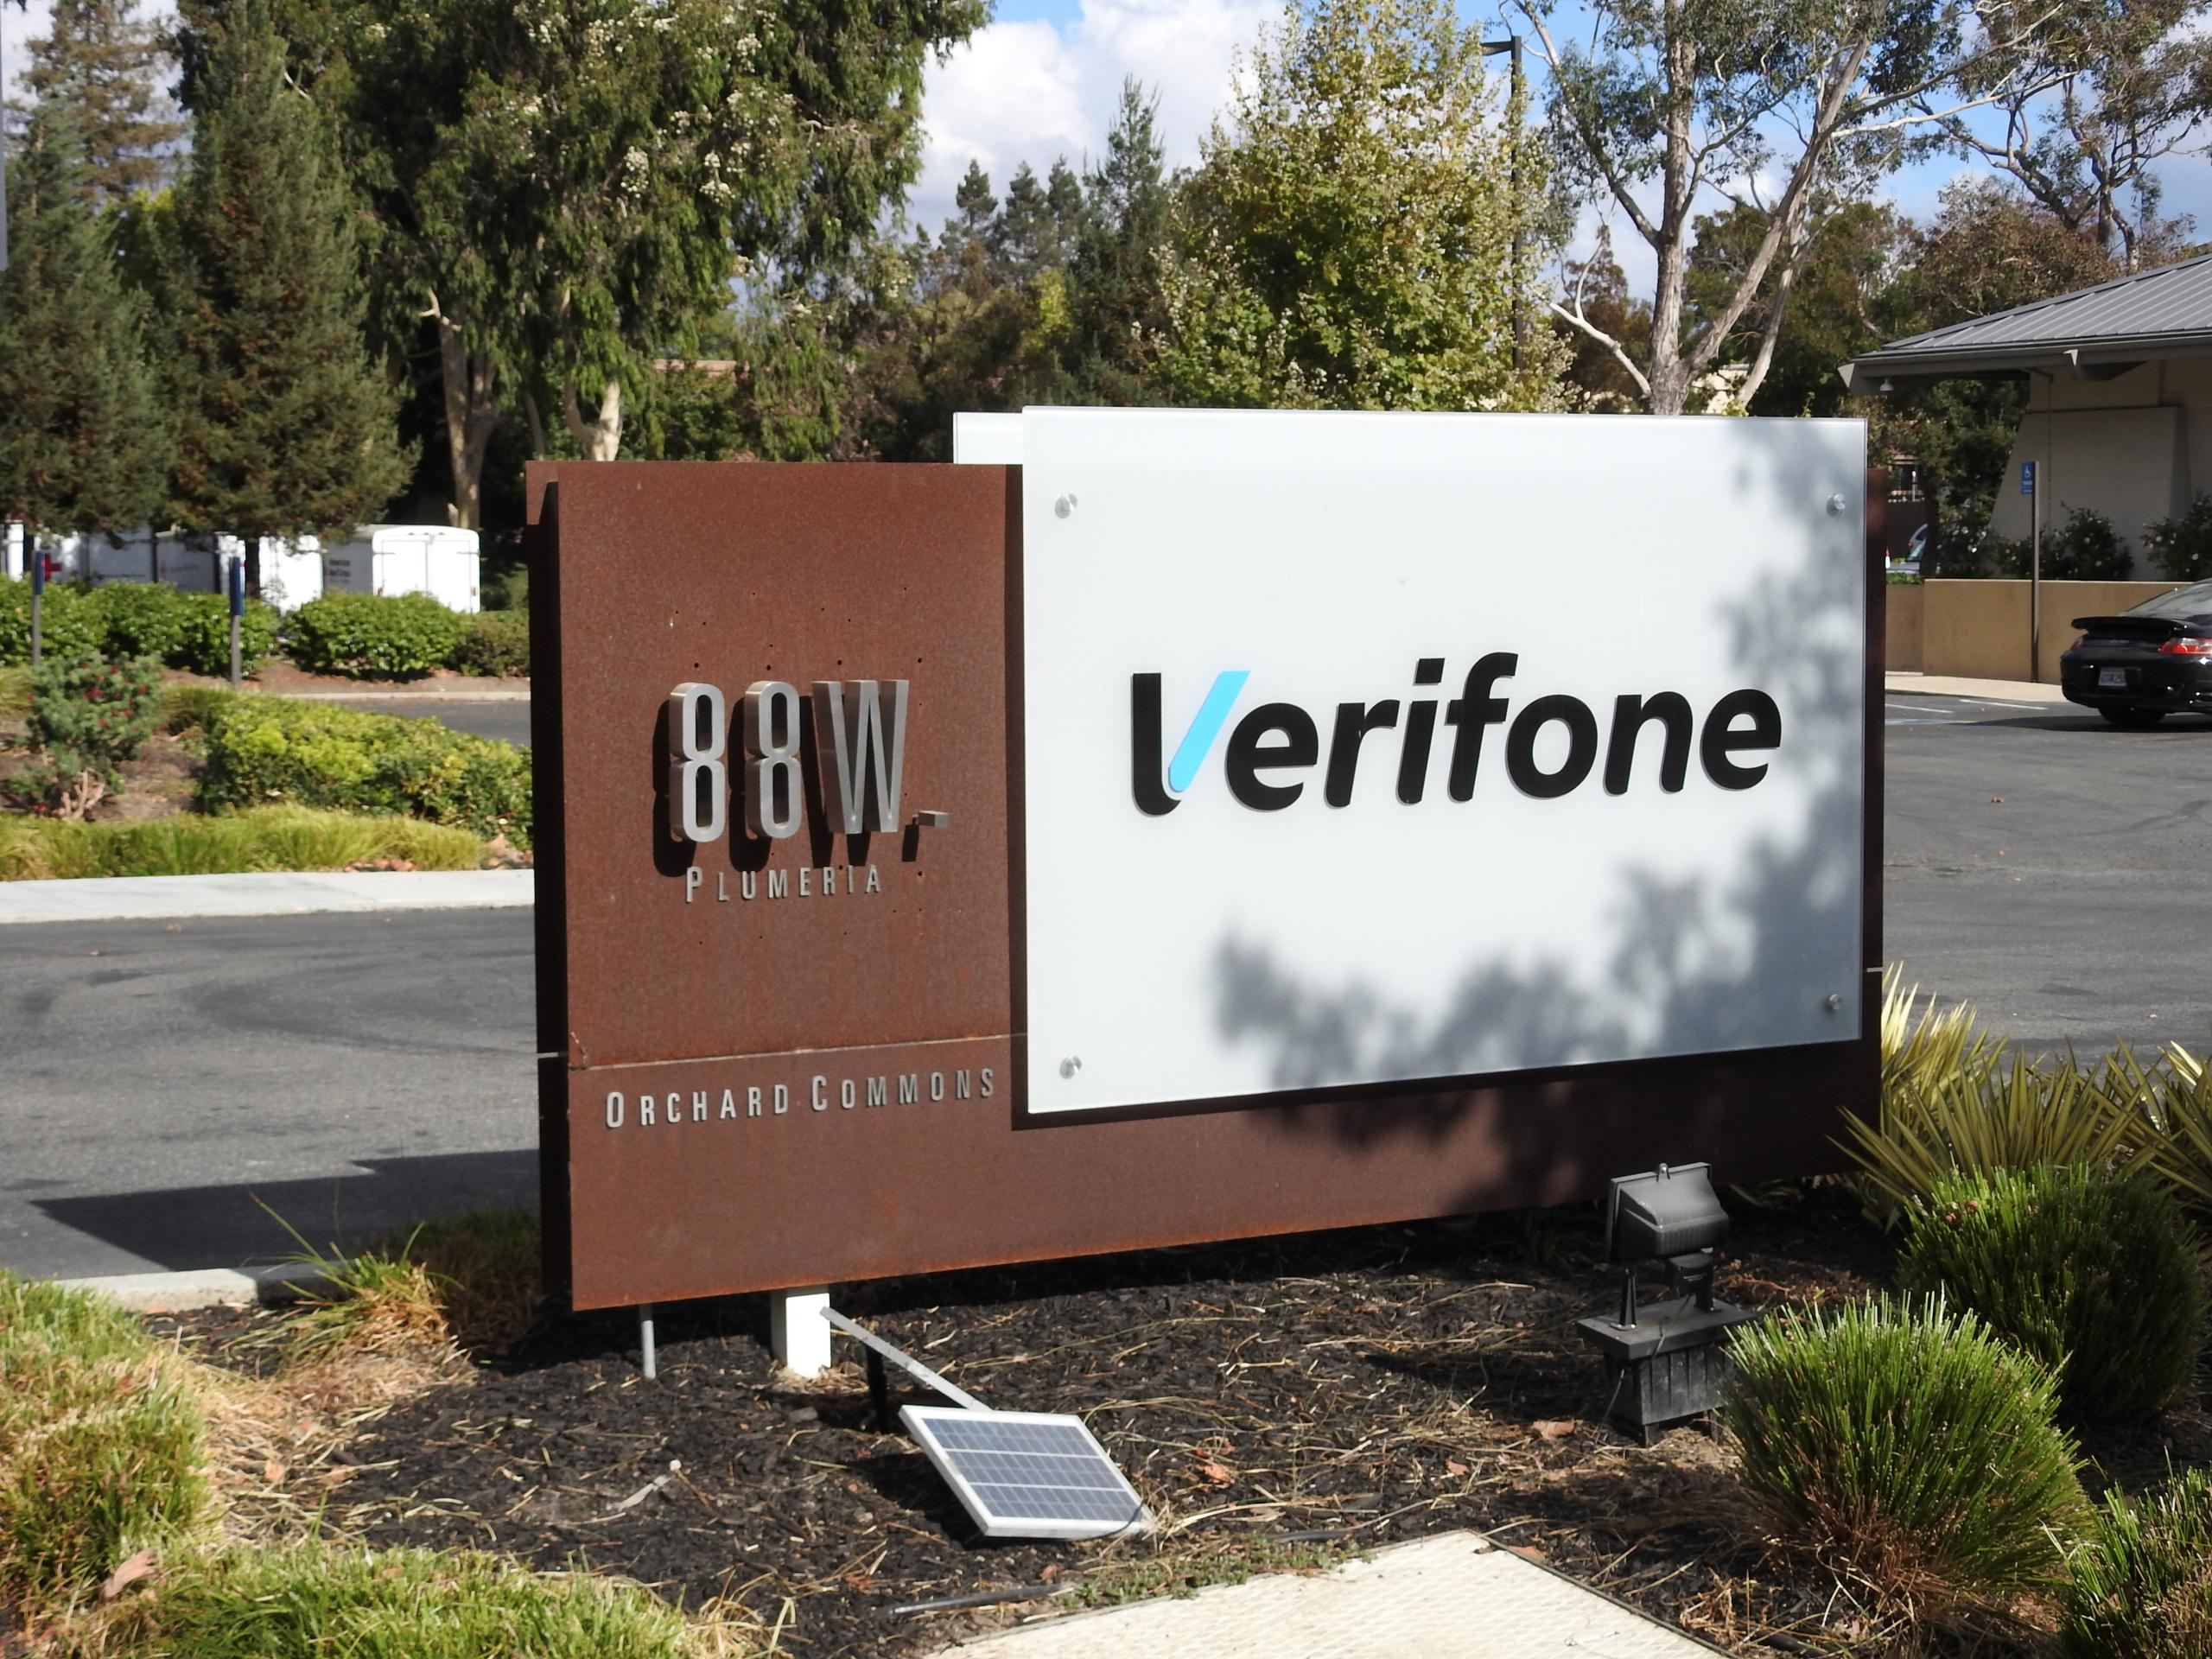 Entrance to VeriFone's corporate headquarters in San Jose, California.